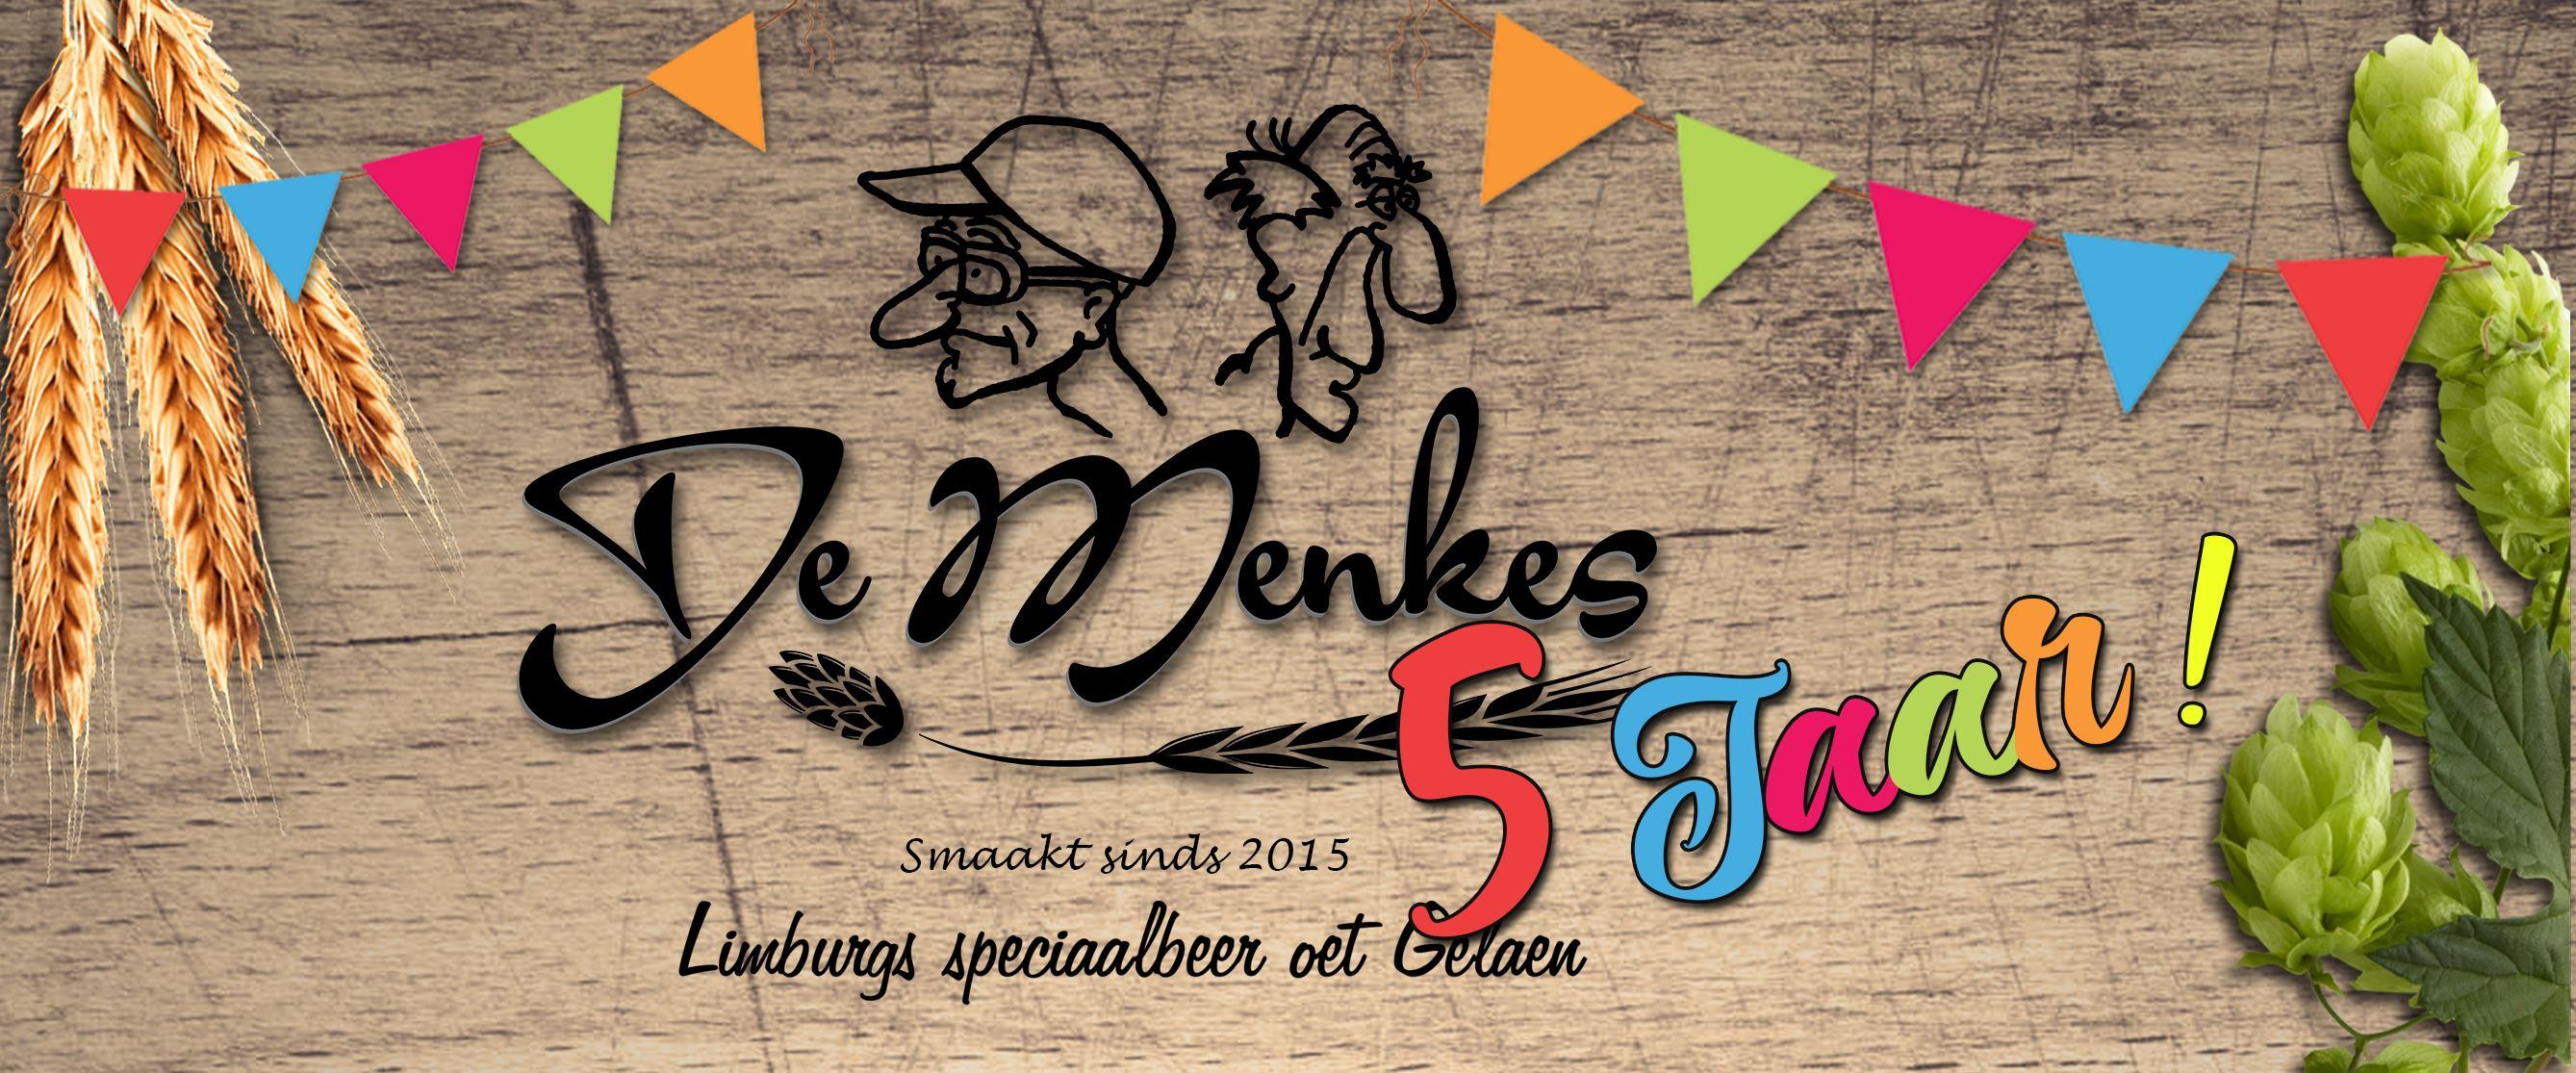 <p>5 jaar De Menkes 19 januari 2020</p>